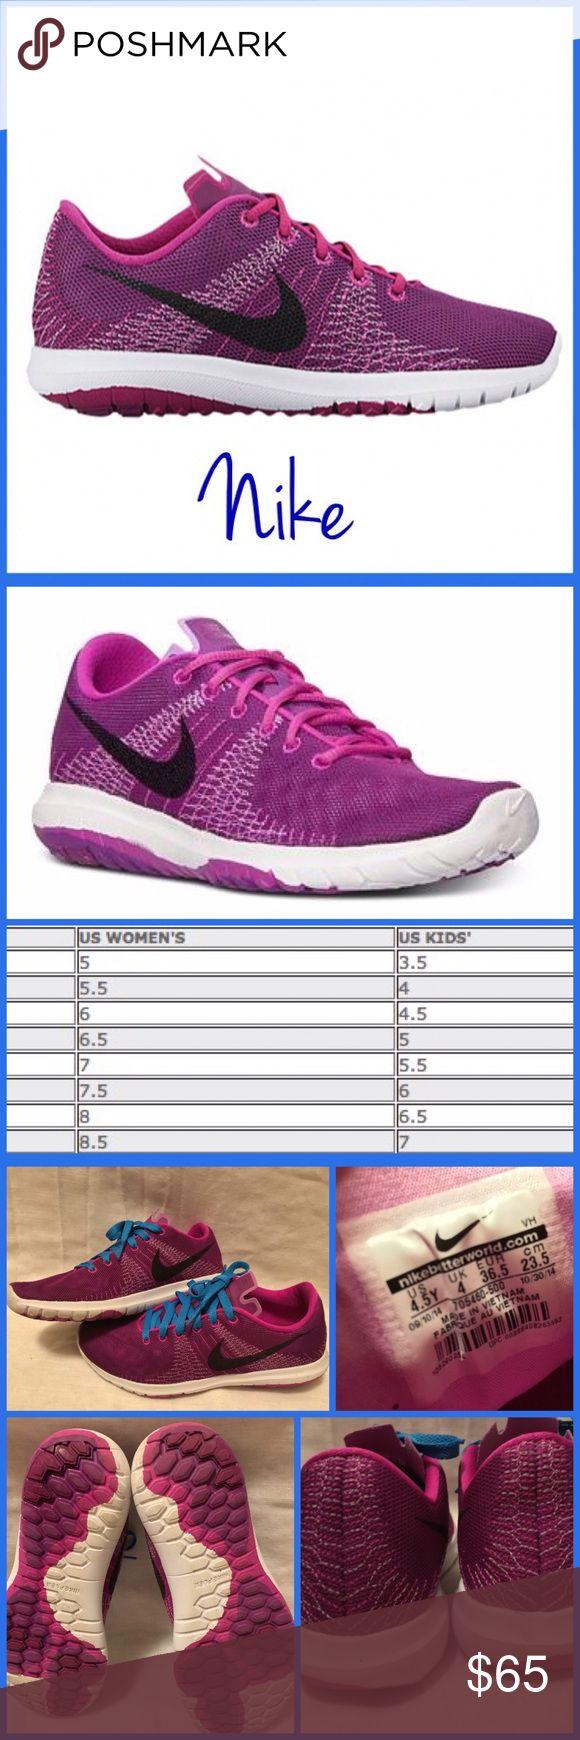 Innovative Shoe Size Chart On Pinterest  Baby Shoe Sizes Size 3 Baby Shoes